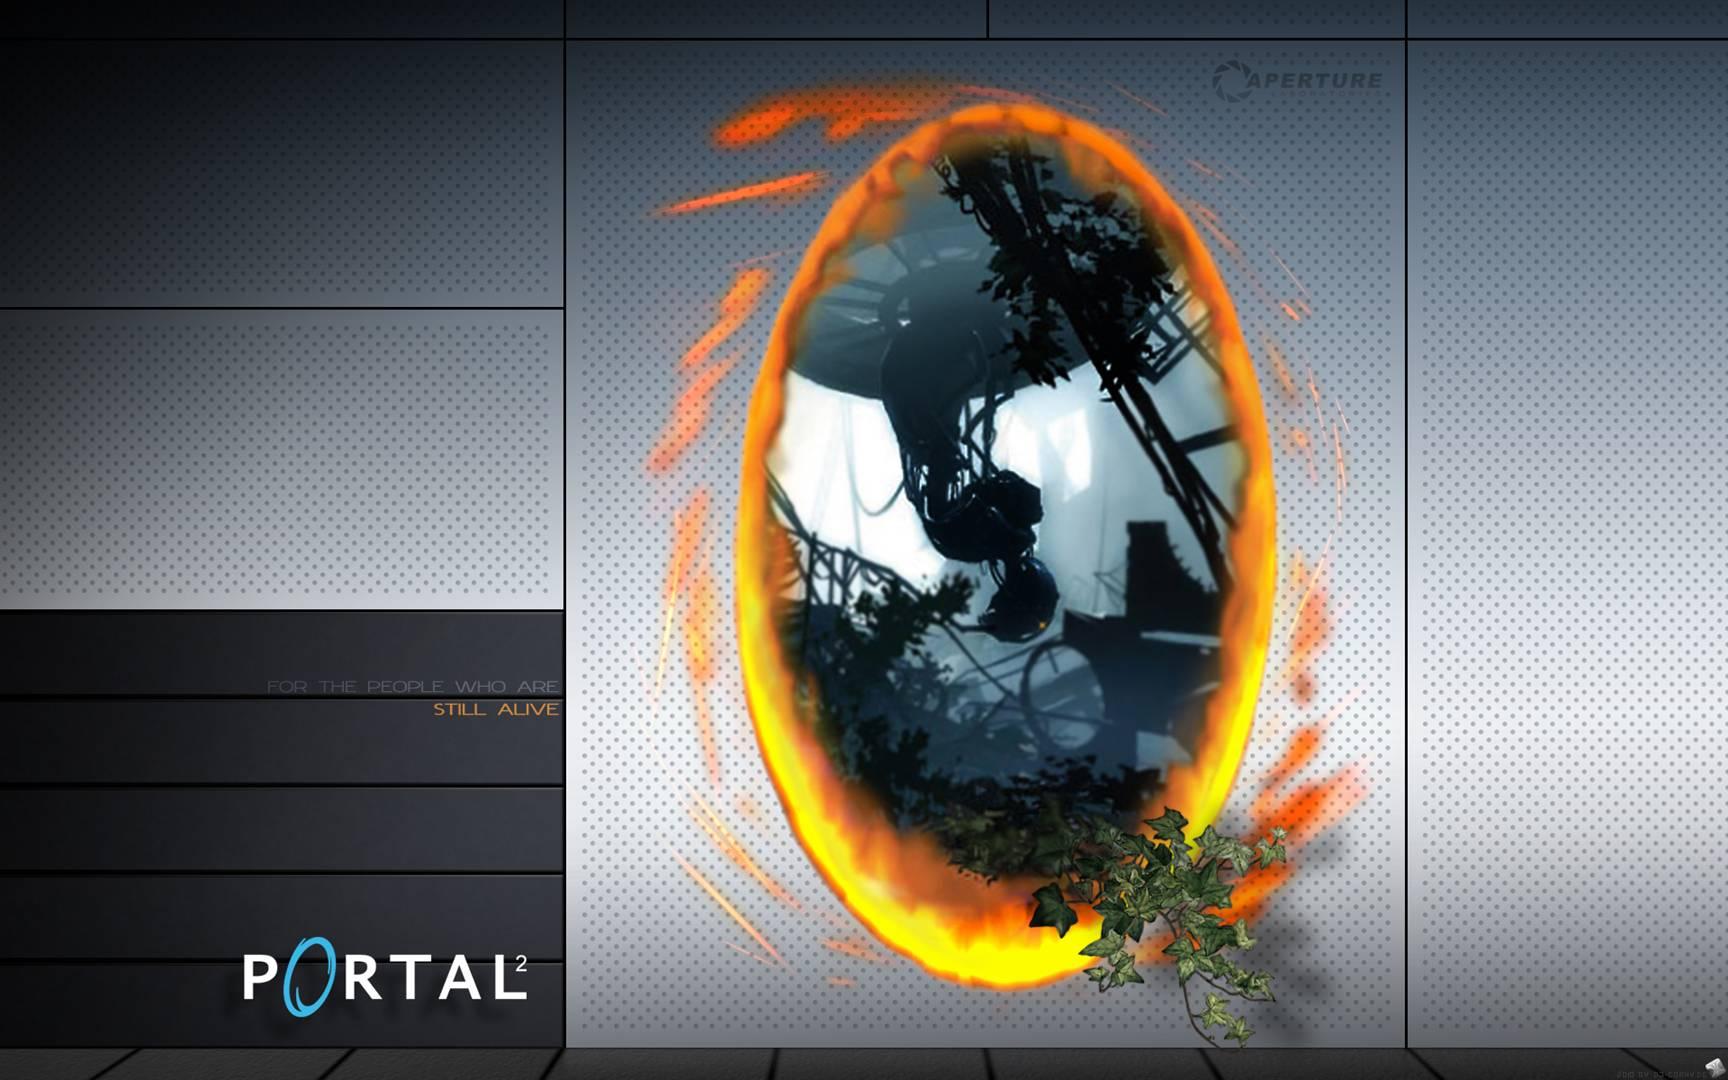 Portal 2 Wallpapers in full 1080P HD « GamingBolt.com ...